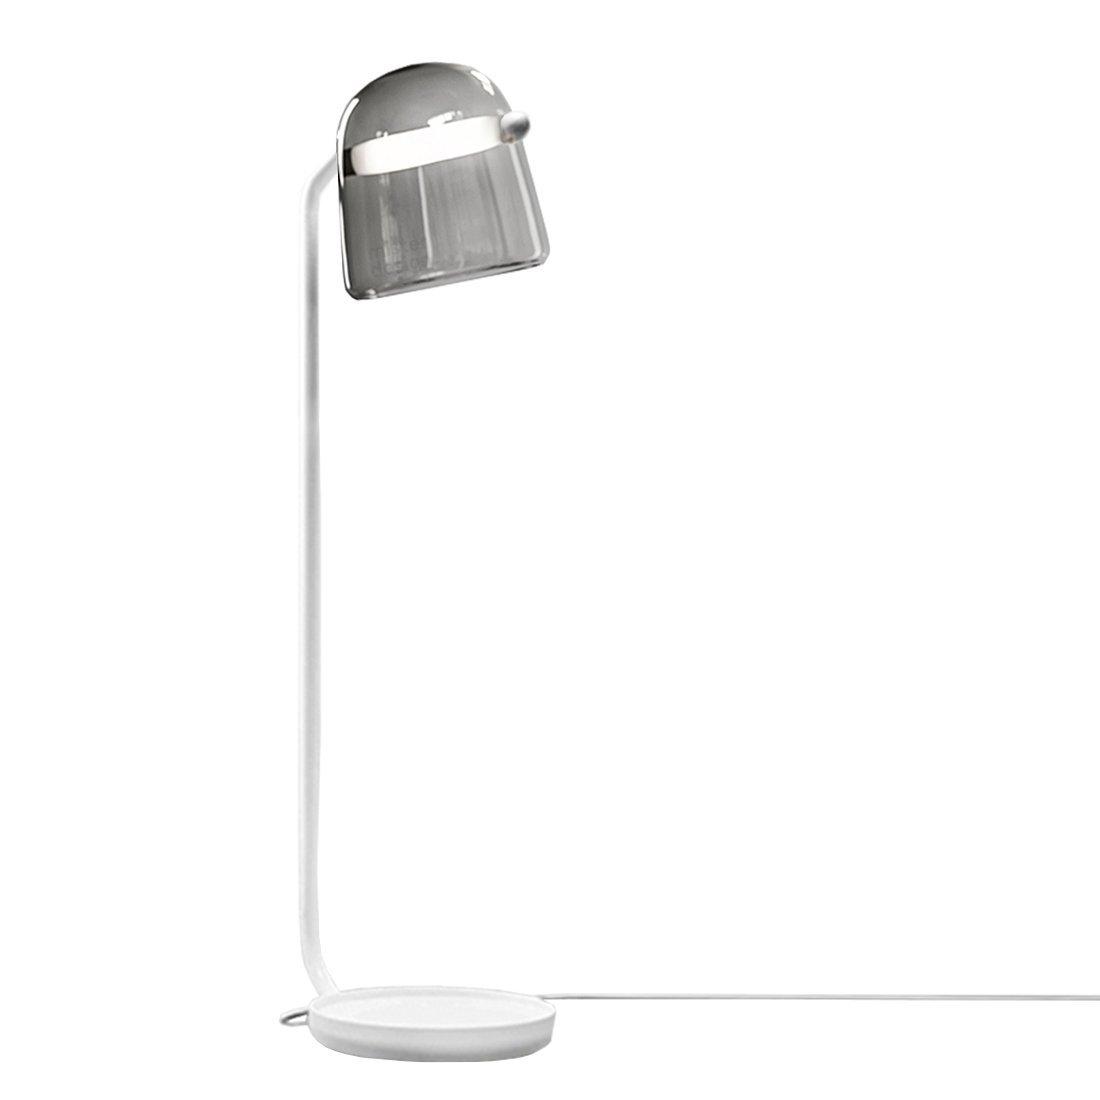 Brokis Mona Vloerlamp Medium Donkergrijs - Witte Body